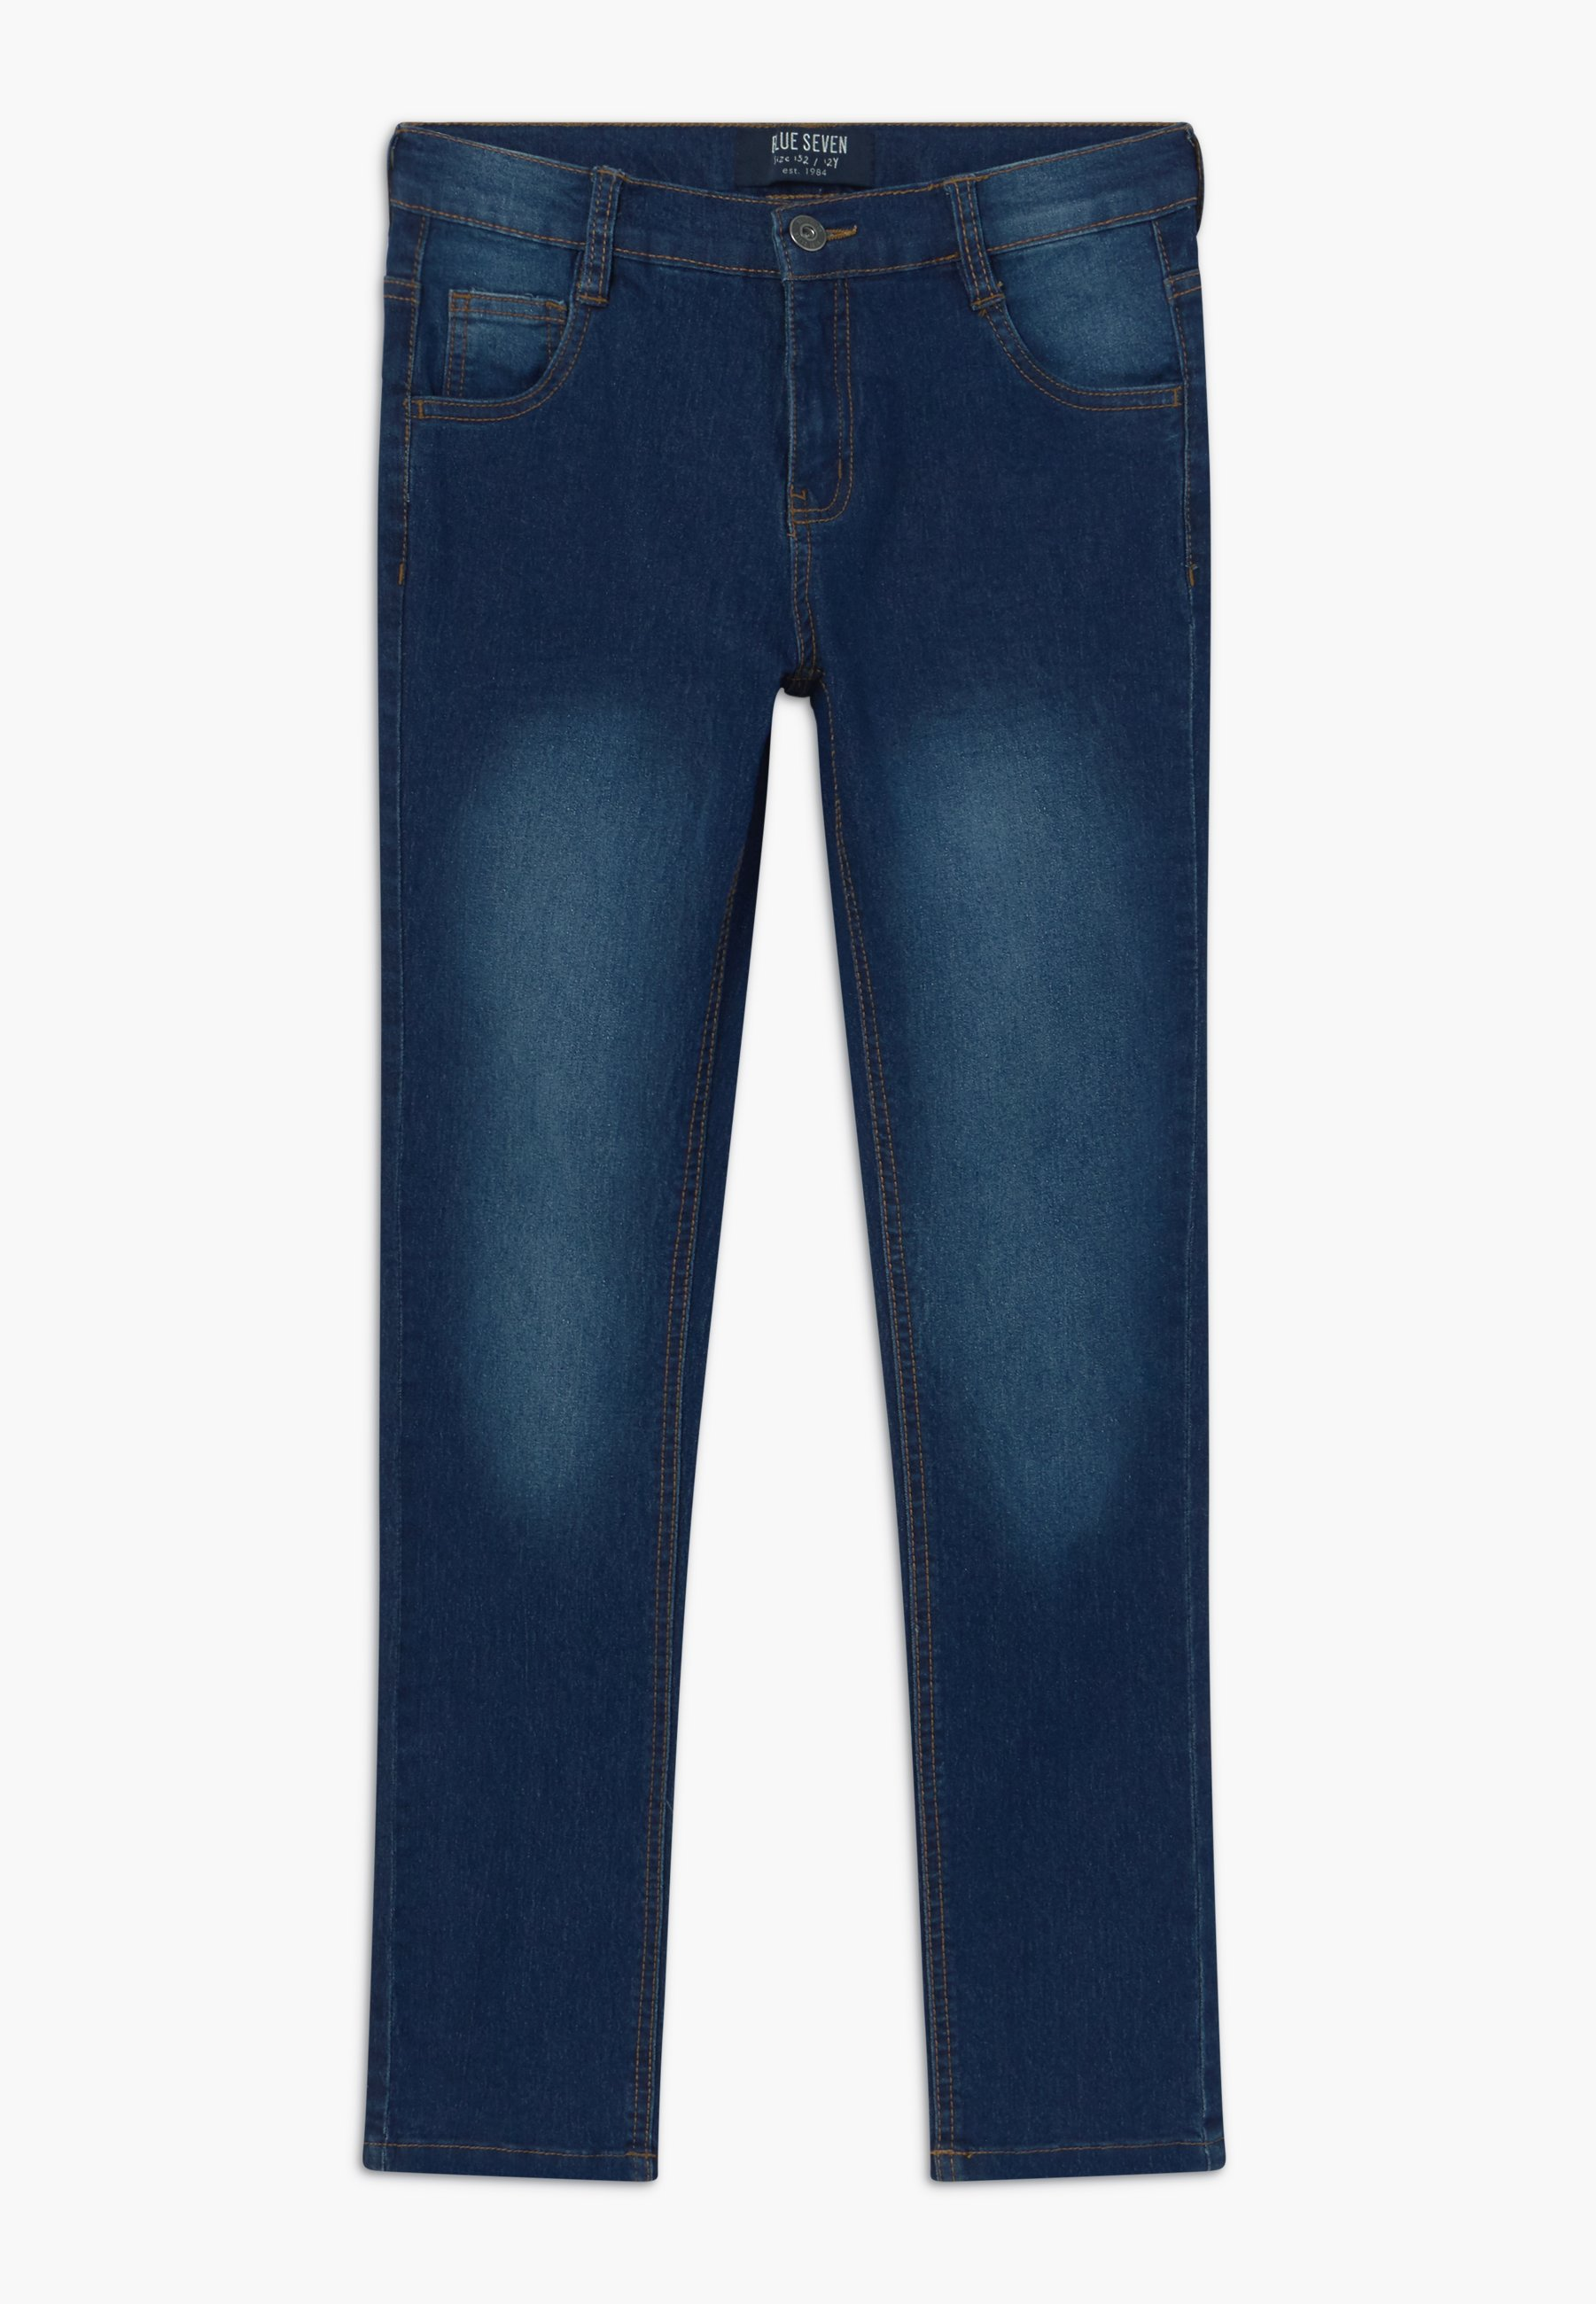 Jeans | Barn | Köp barnjeans online på Zalando.se